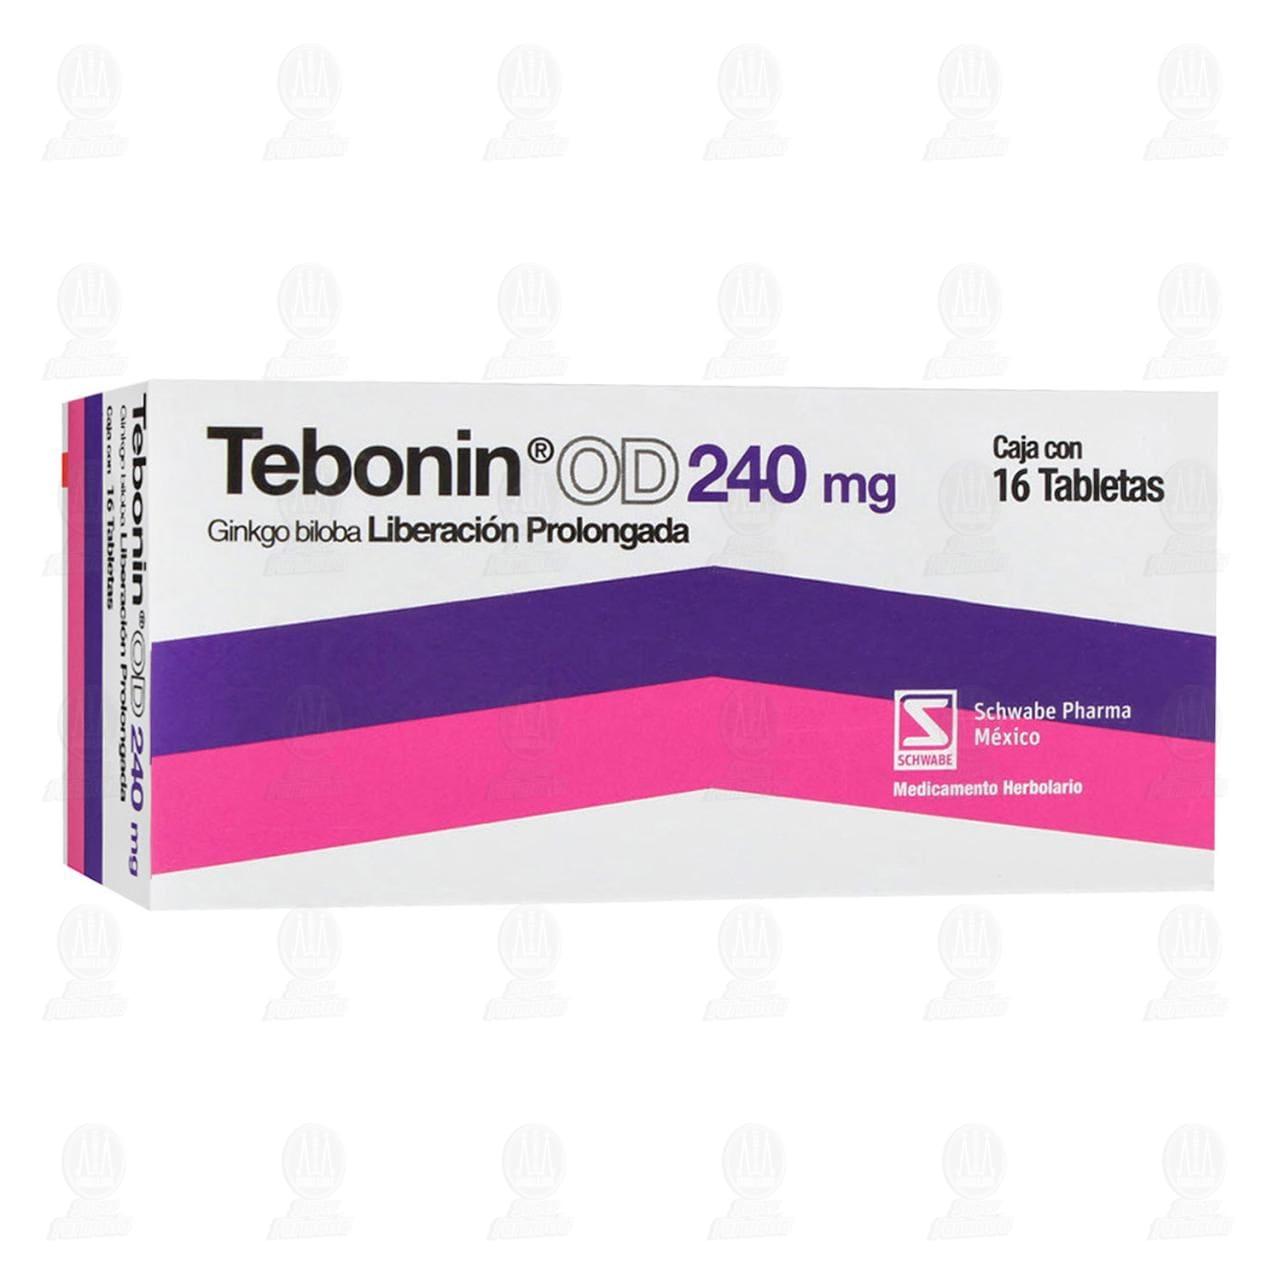 Comprar Tebonin OD 240mg 16 Tabletas en Farmacias Guadalajara